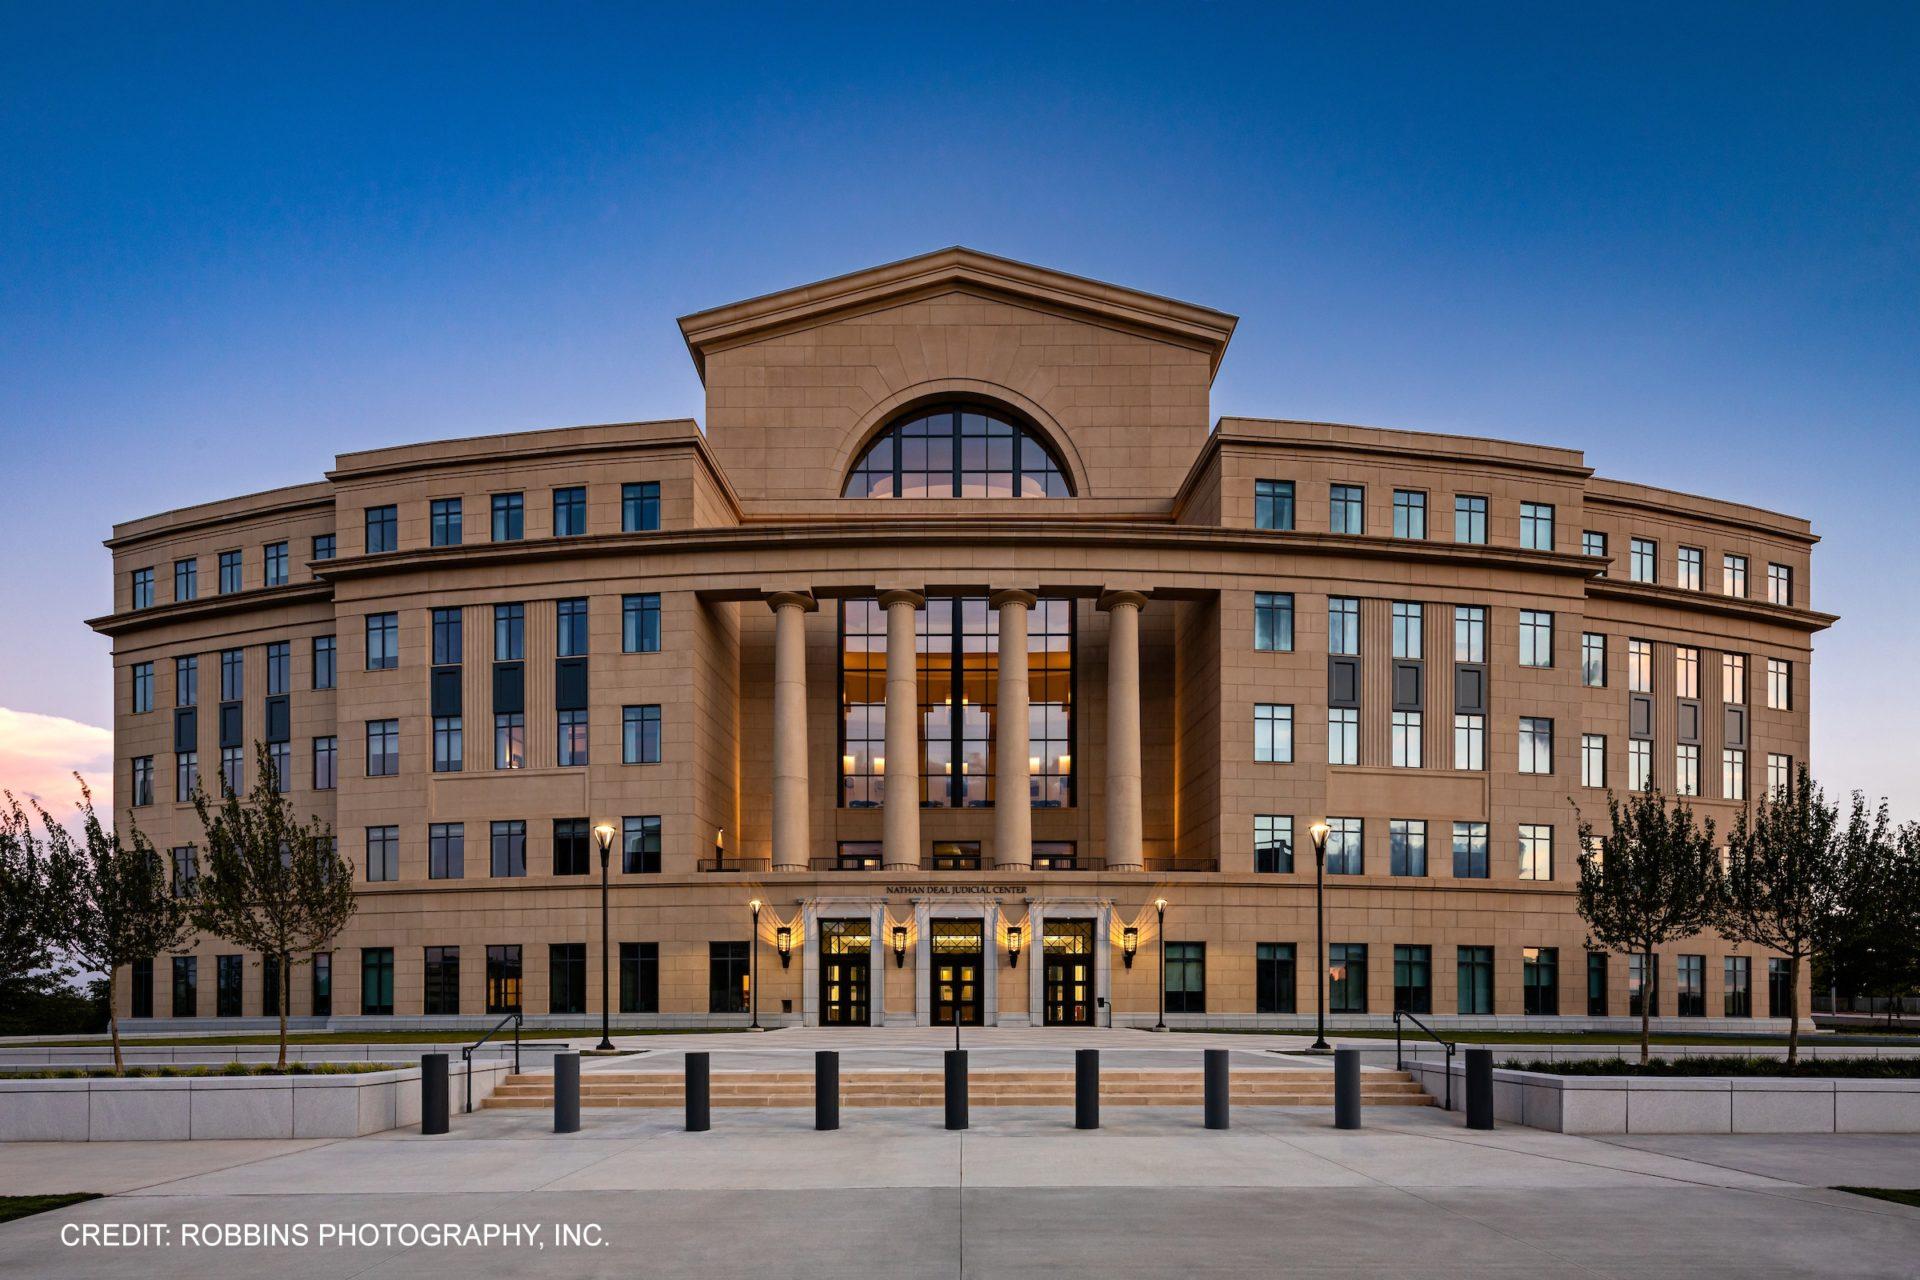 Nathan Deal Judicial Center, Atlanta, GA – Government and Public Buildings